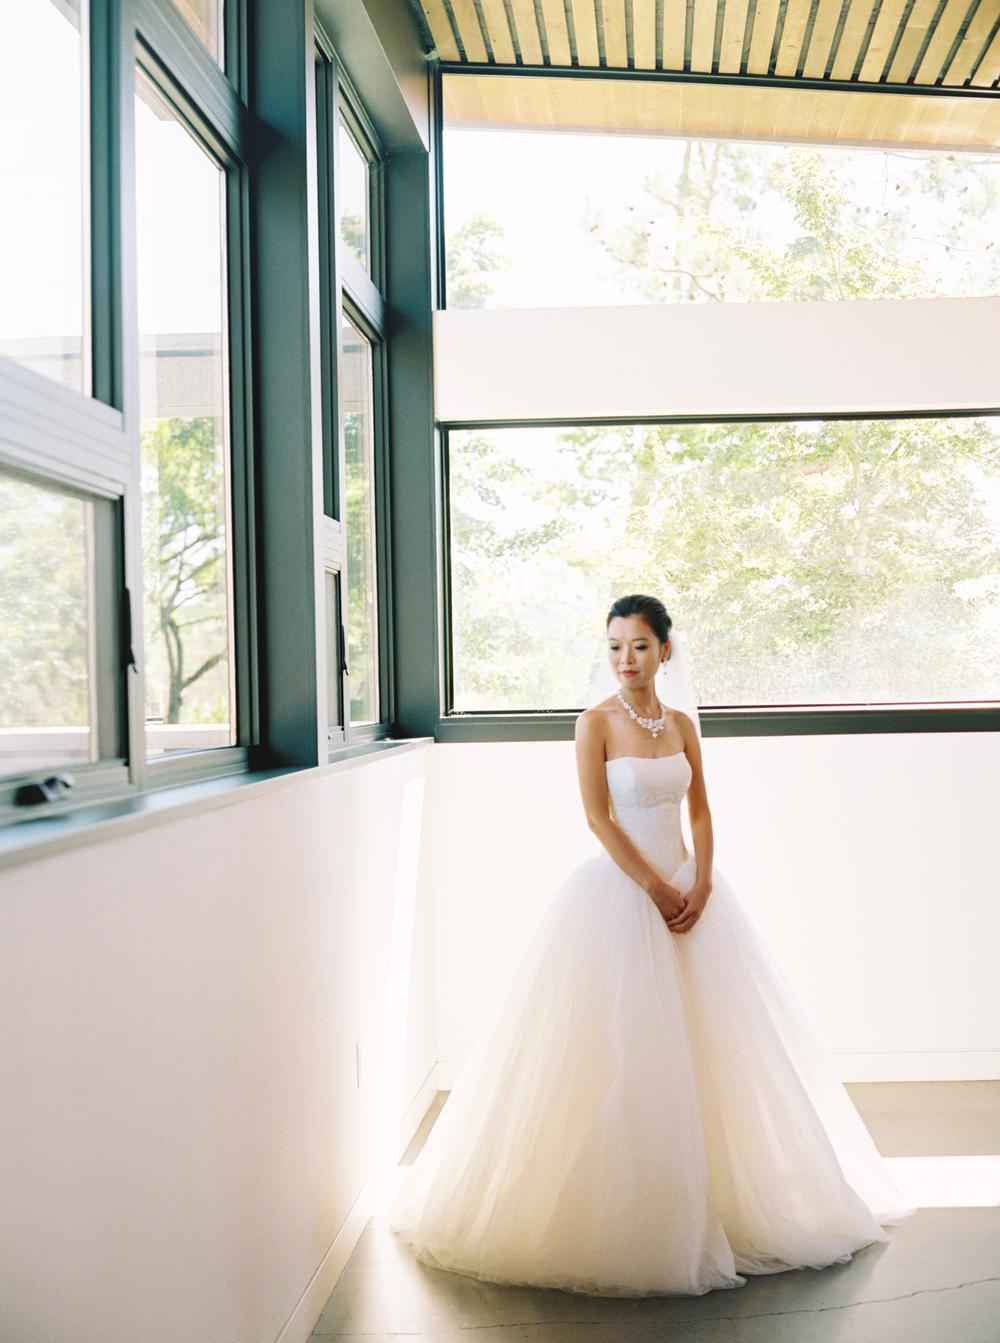 016+Saffron+Fields+Oregon+Fine+Art+Wedding+Photographer+Outlive+Creative.jpg